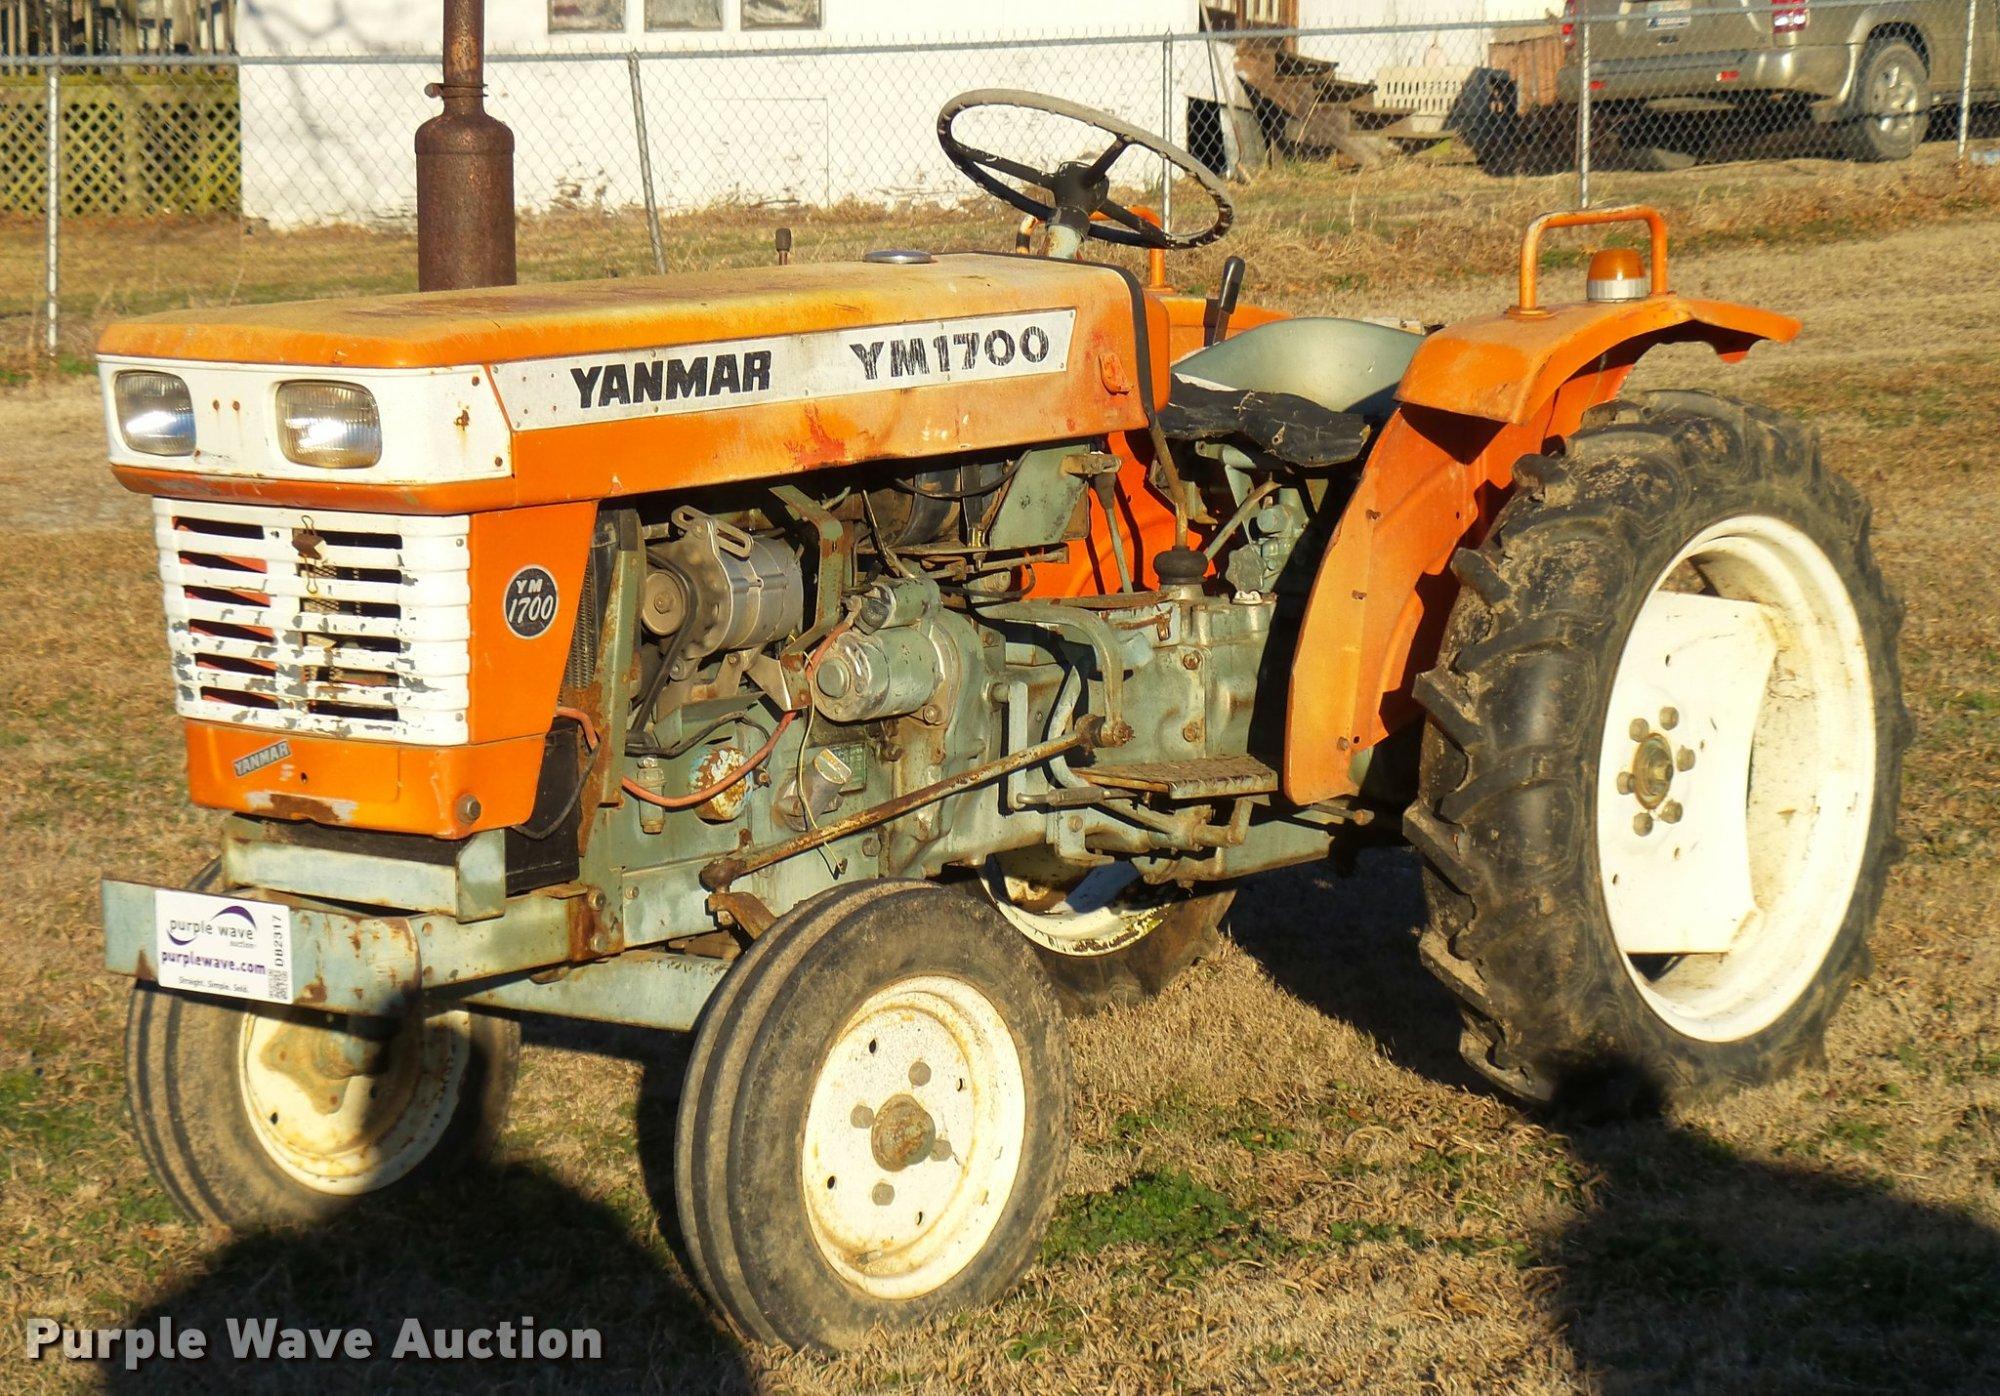 hight resolution of yanmar ym1700 tractor item db2317 sold february 22 ag e yanmar ym 1700 tractor wiring diagram